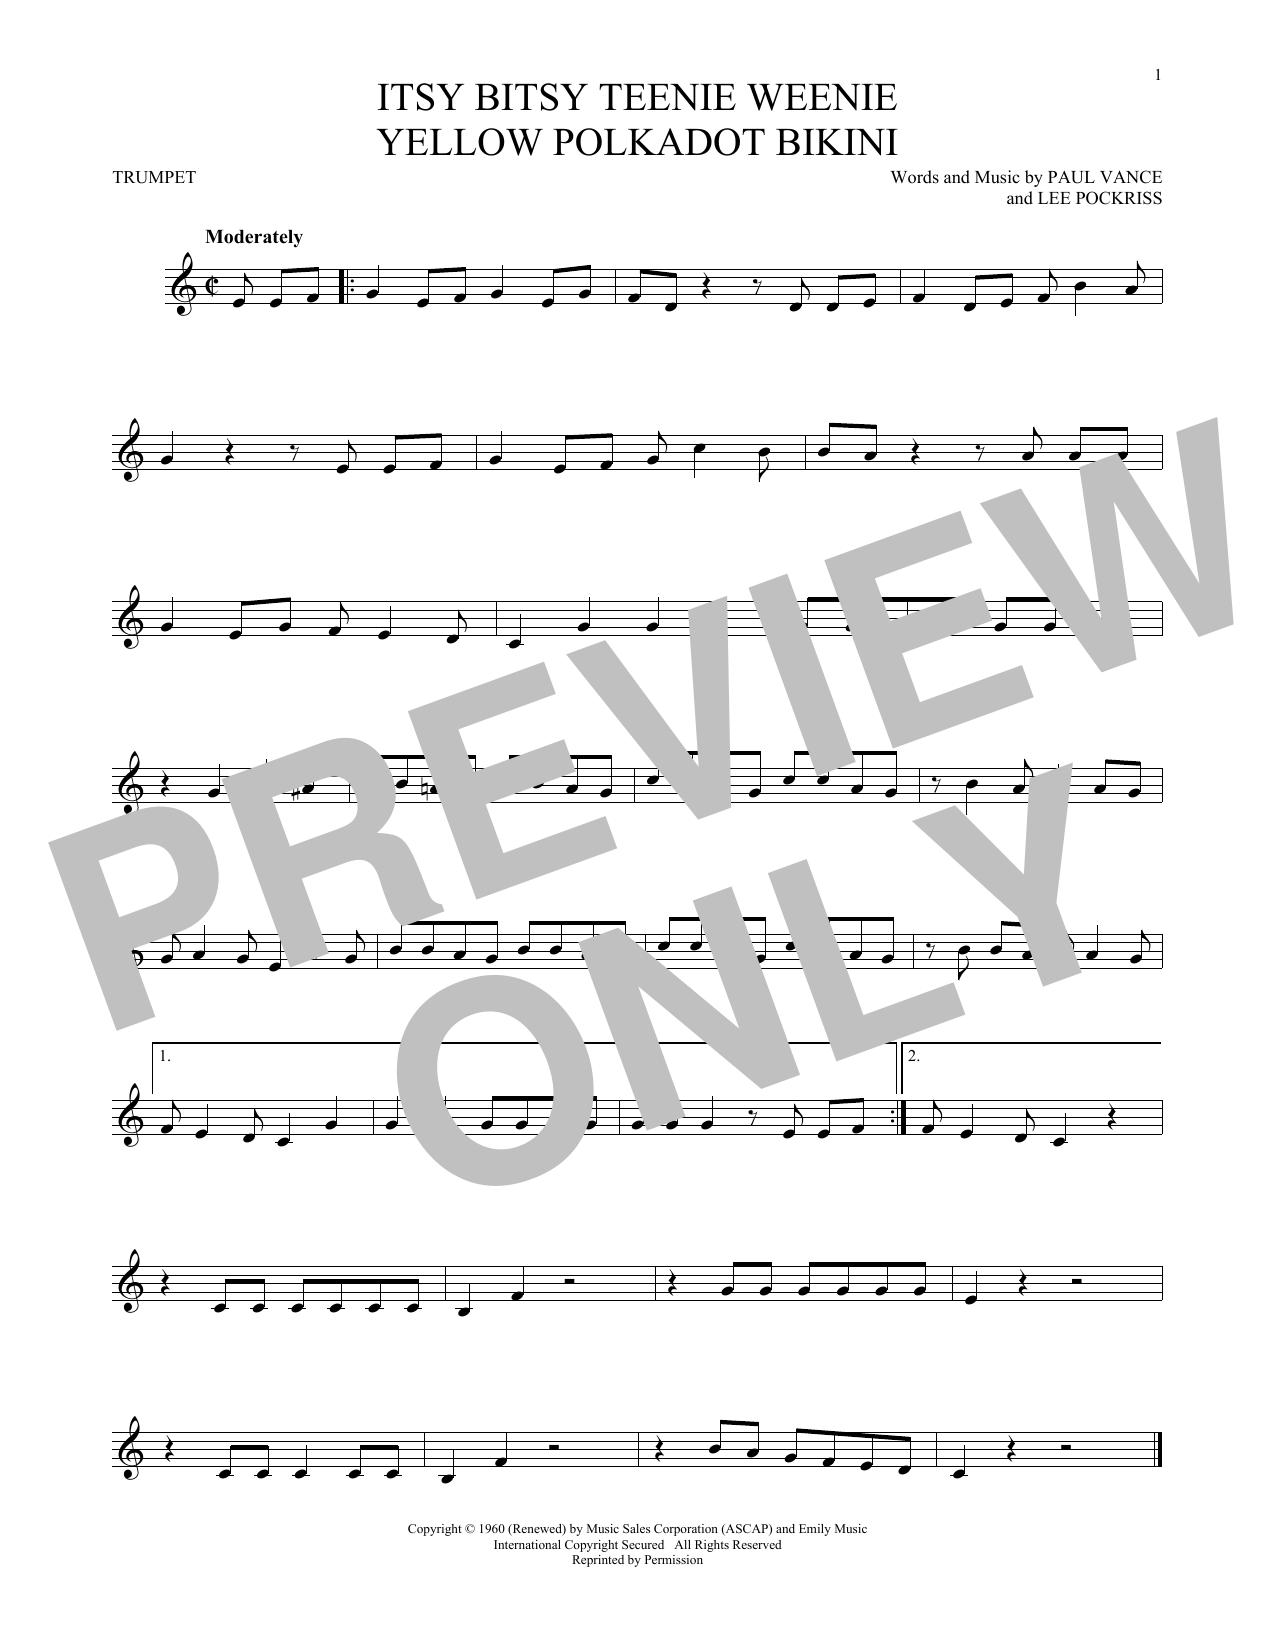 Itsy Bitsy Teenie Weenie Yellow Polkadot Bikini (Trumpet Solo)